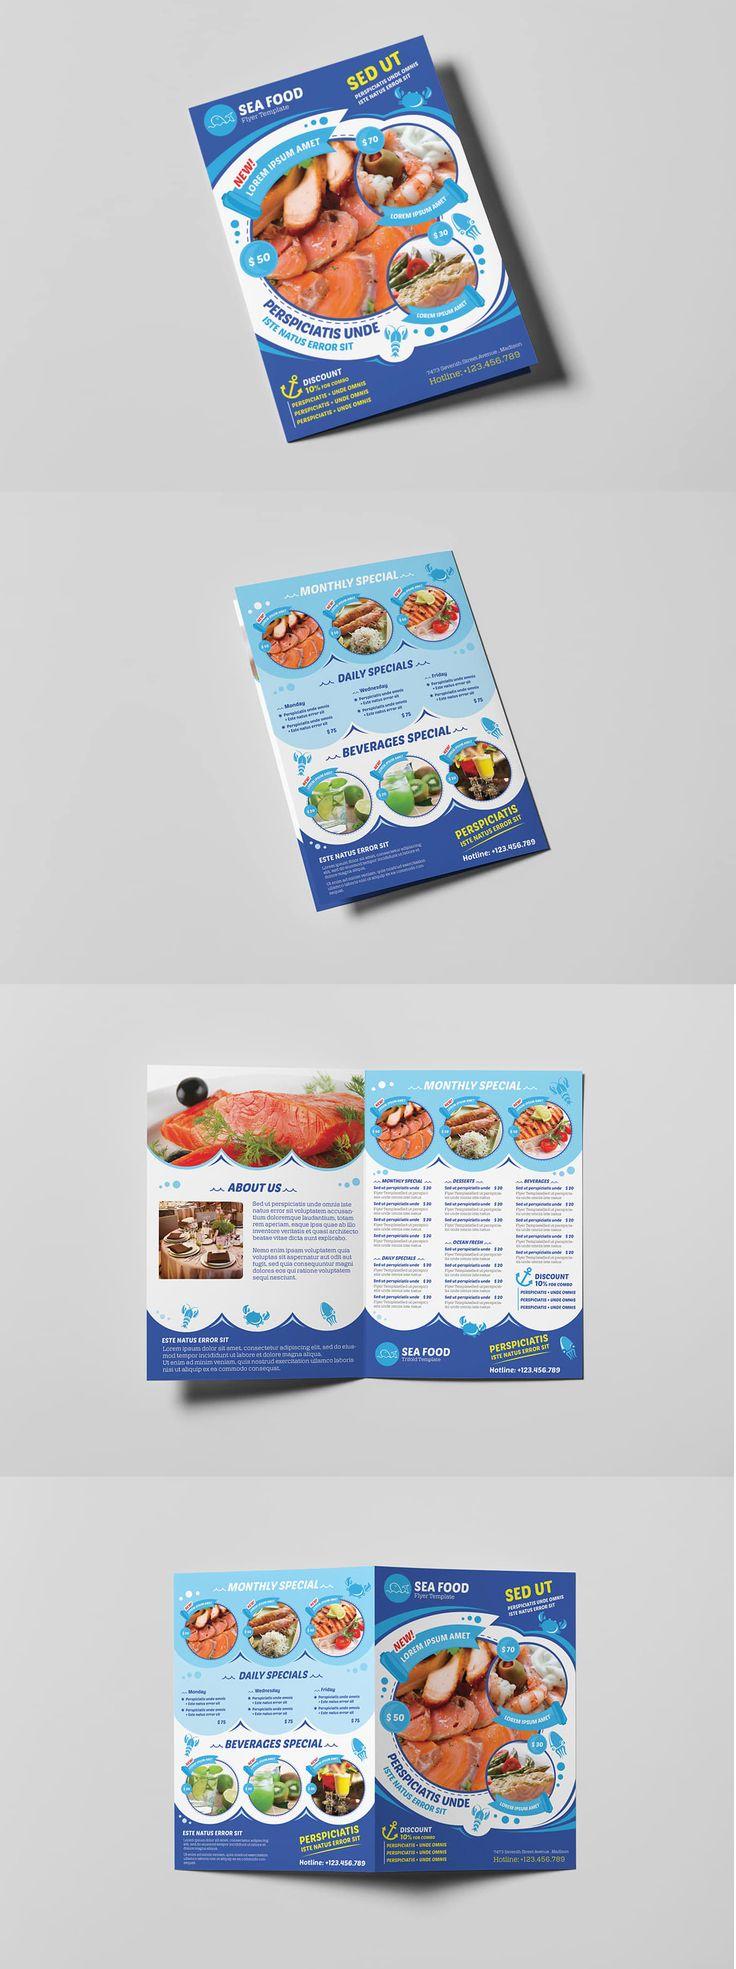 Seafood Restaurant A5 Brochure / Leaflet Template PSD